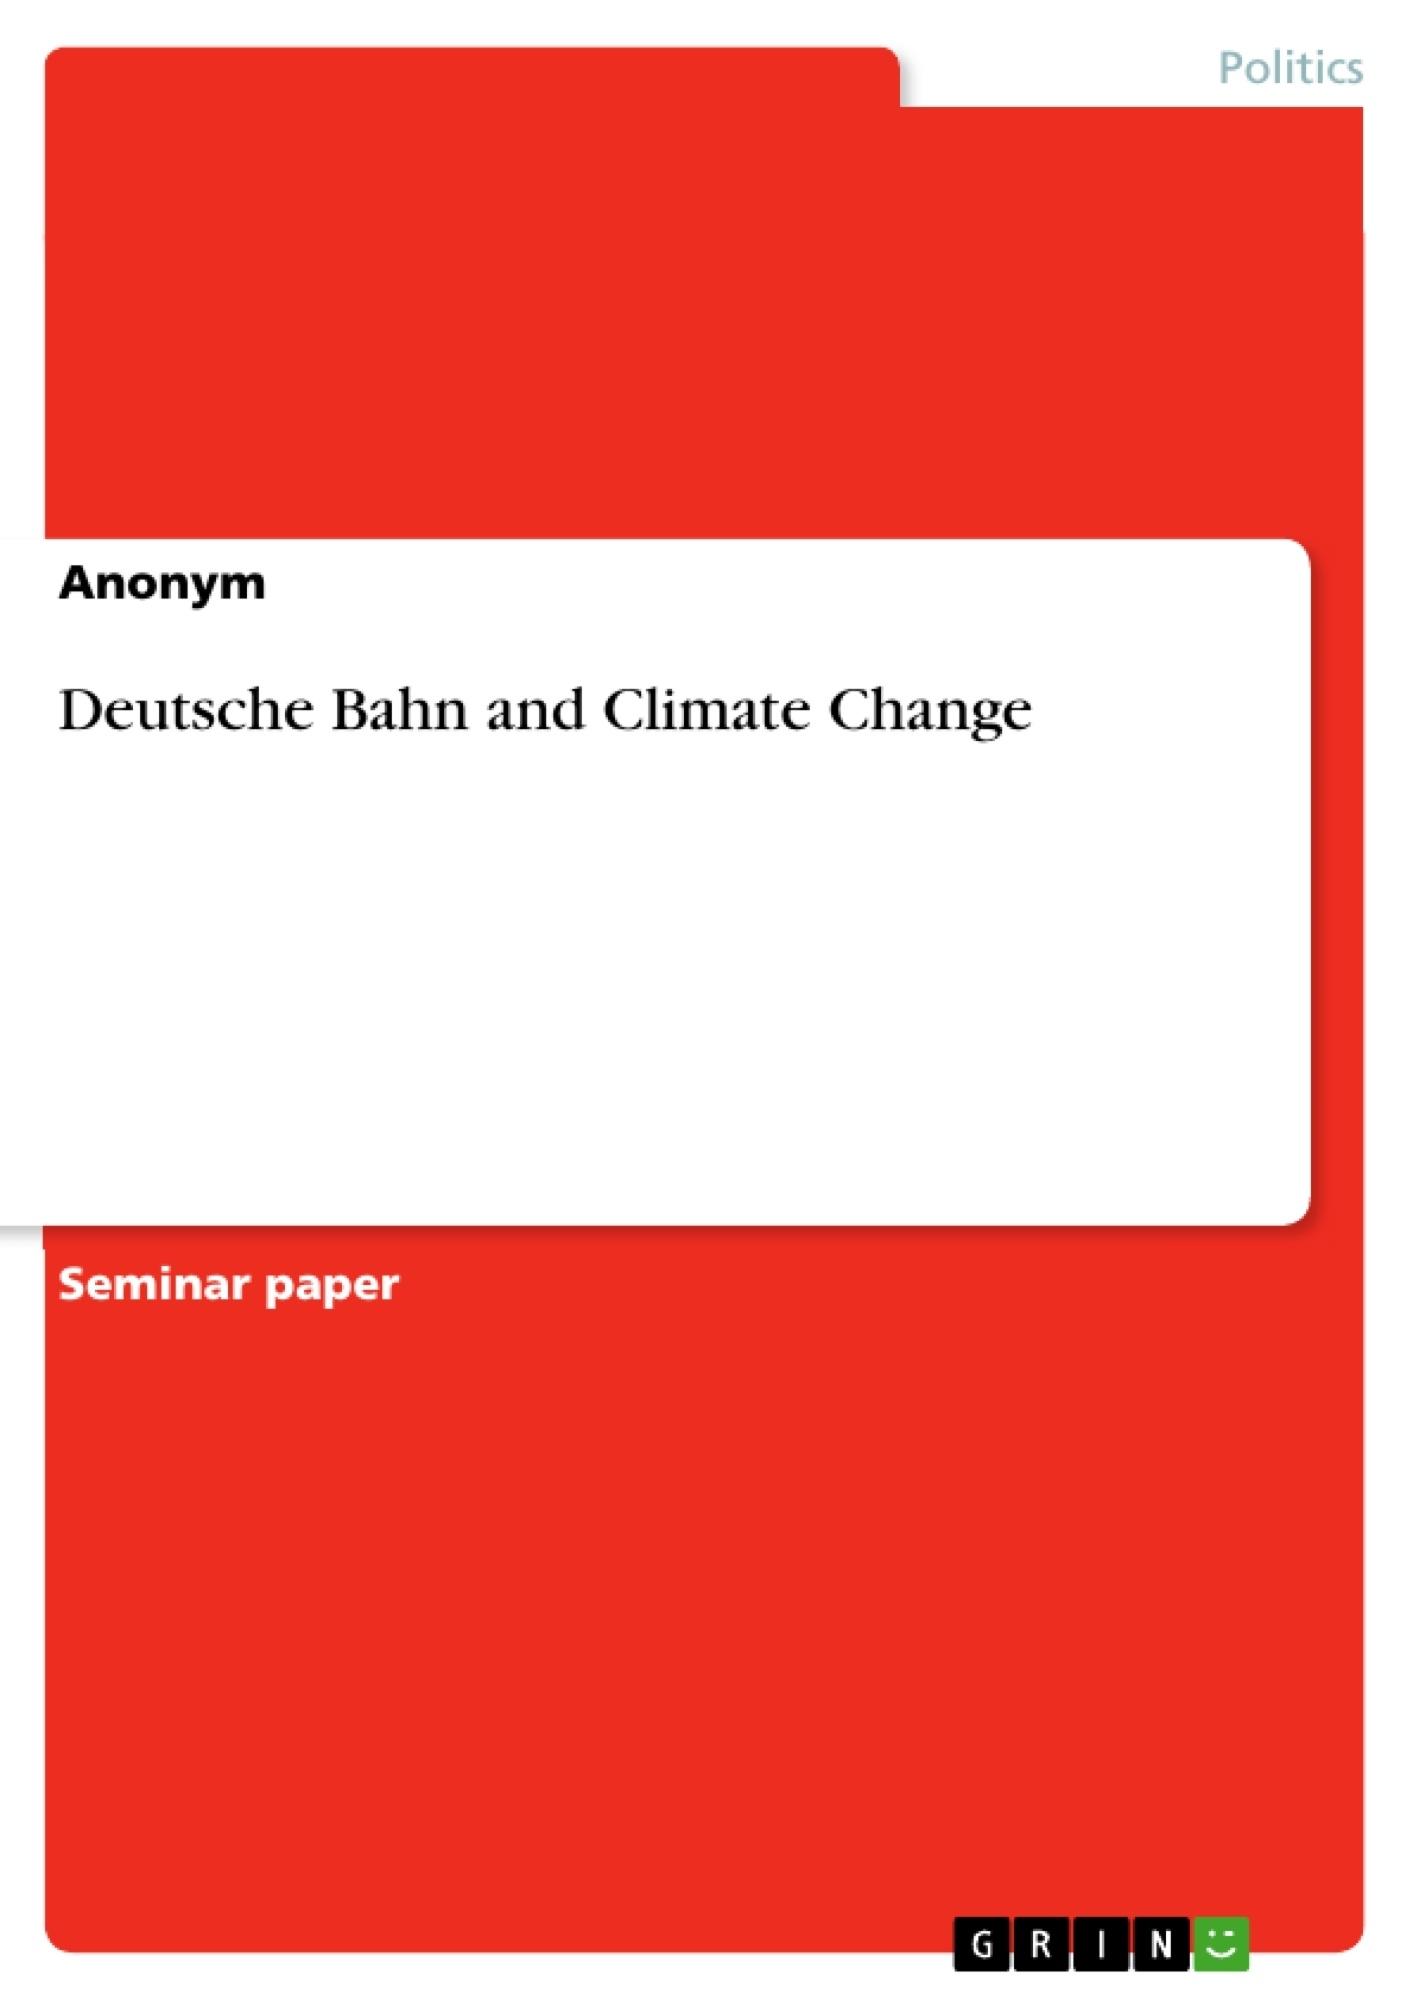 Title: Deutsche Bahn and Climate Change